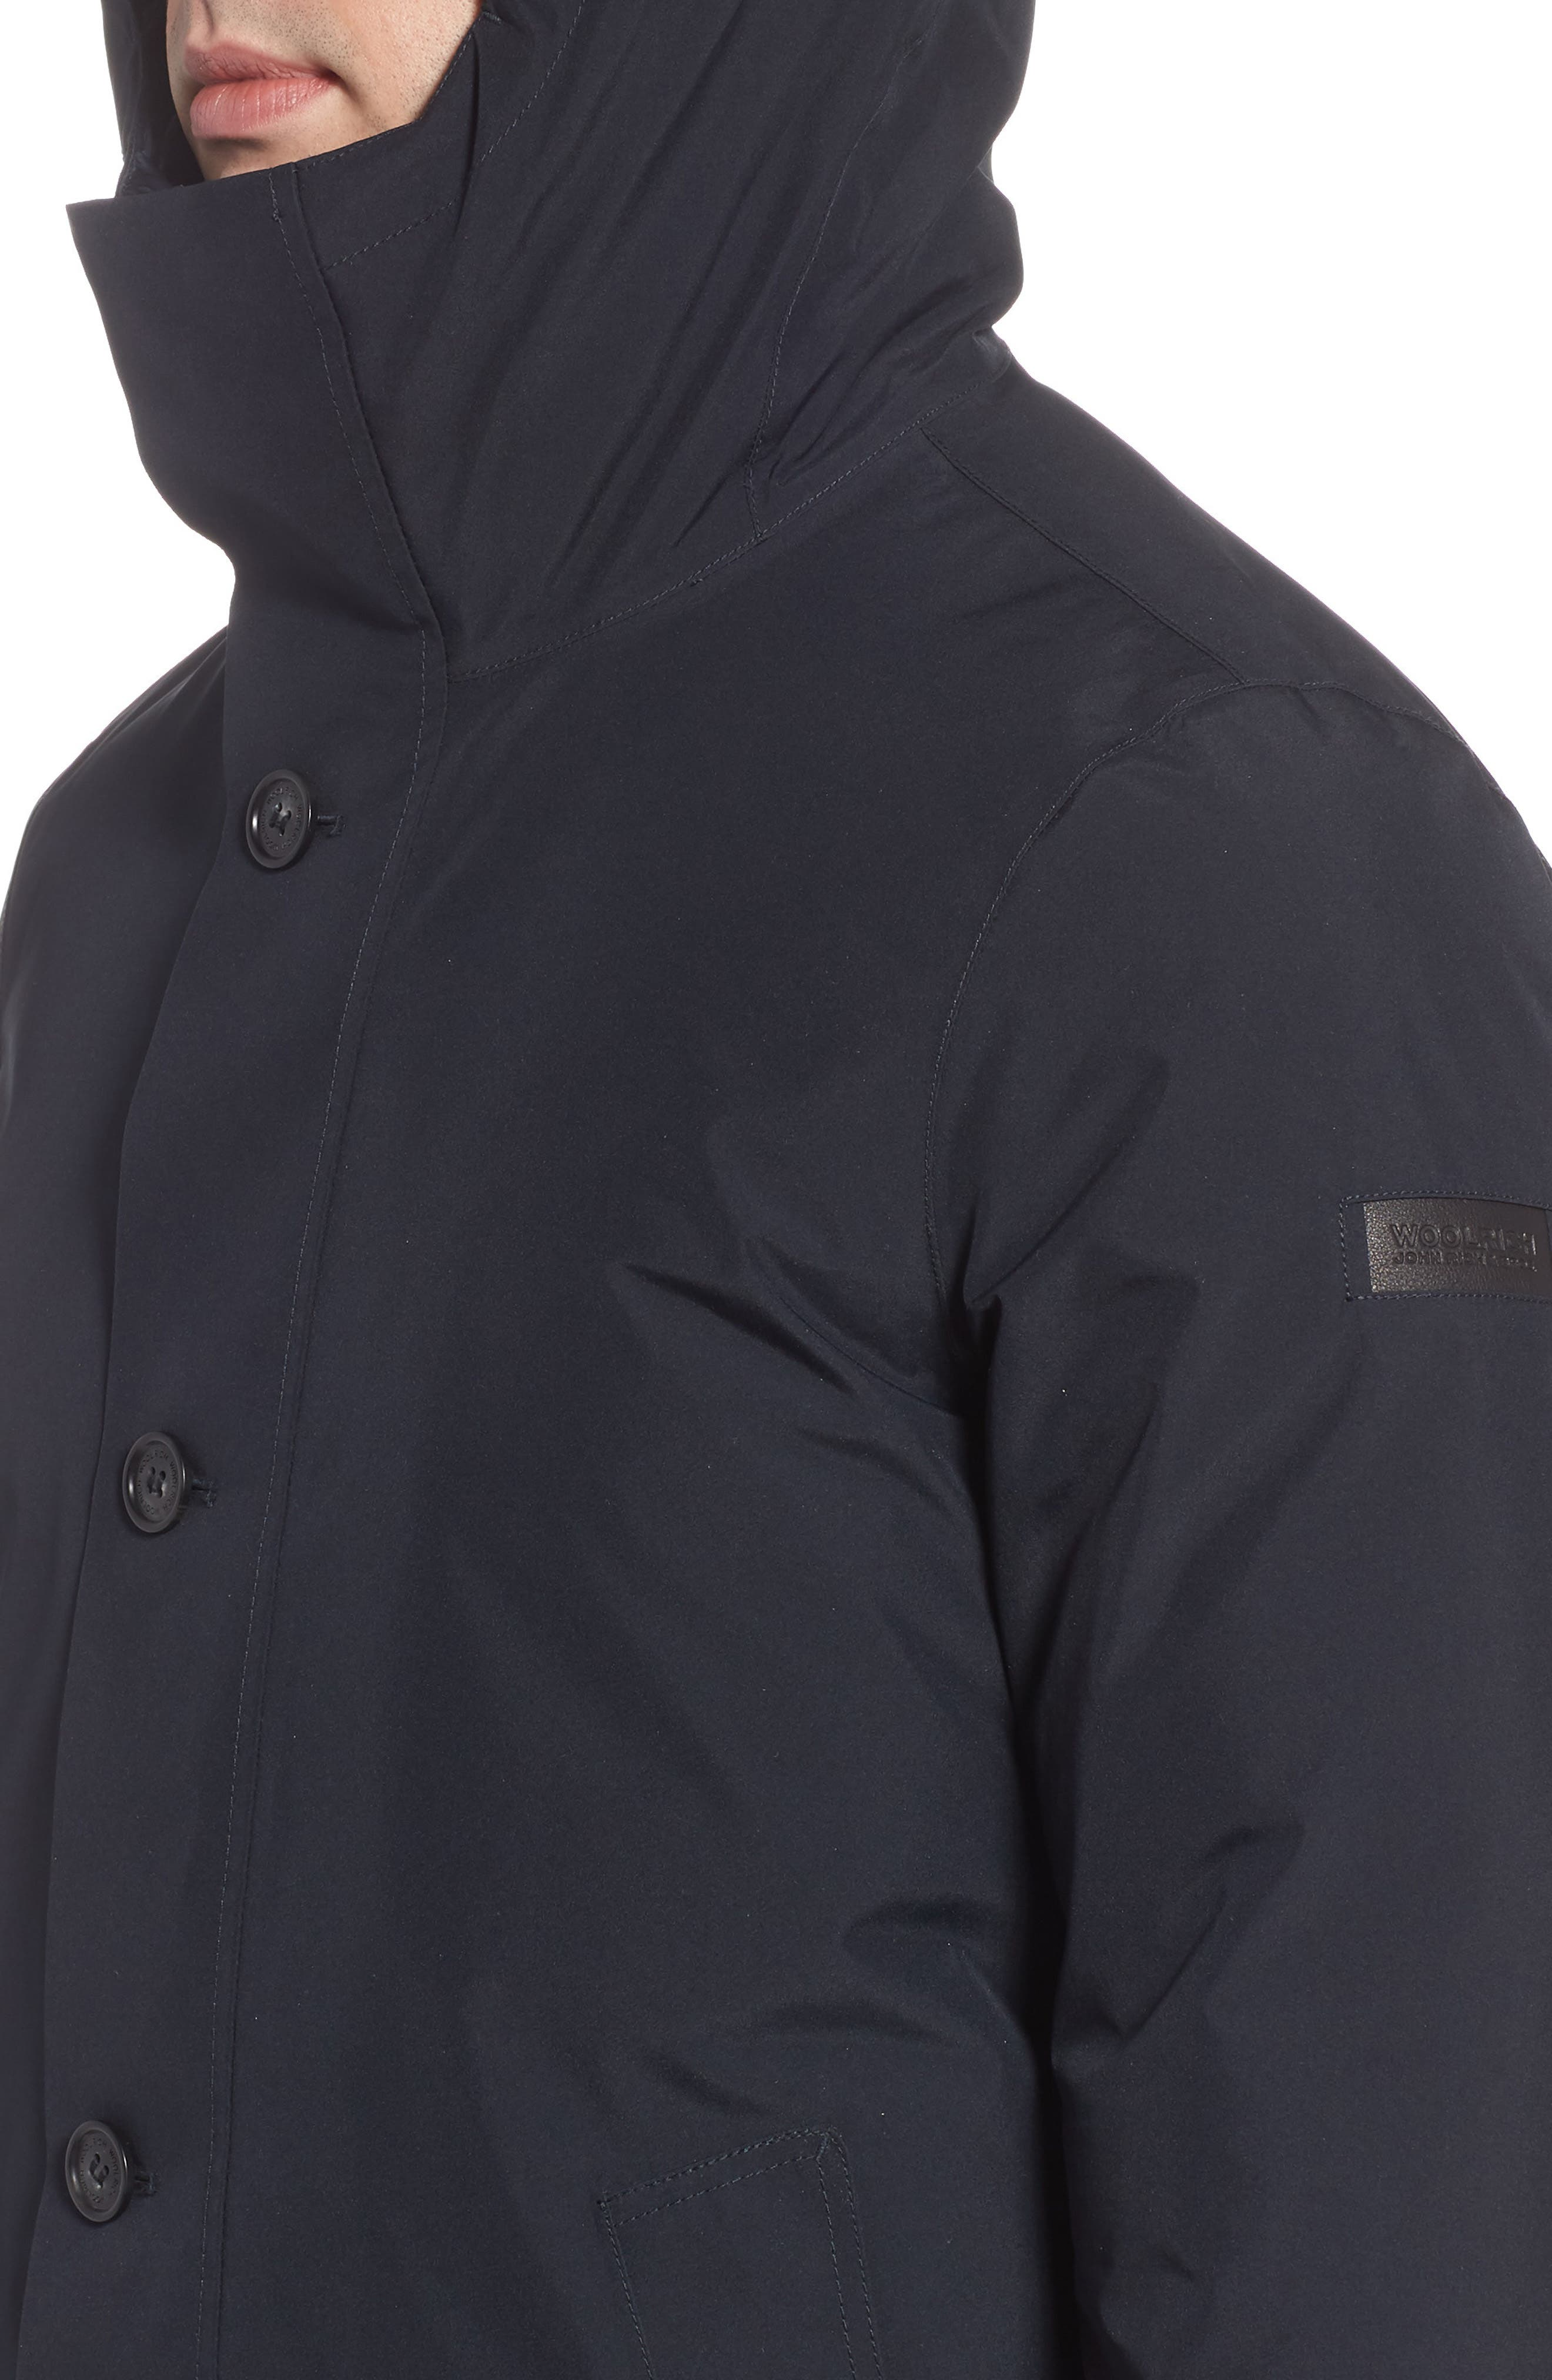 Waterproof Gore-Tex<sup>®</sup> Alpine Jacket,                             Alternate thumbnail 4, color,                             NAVY MELTON